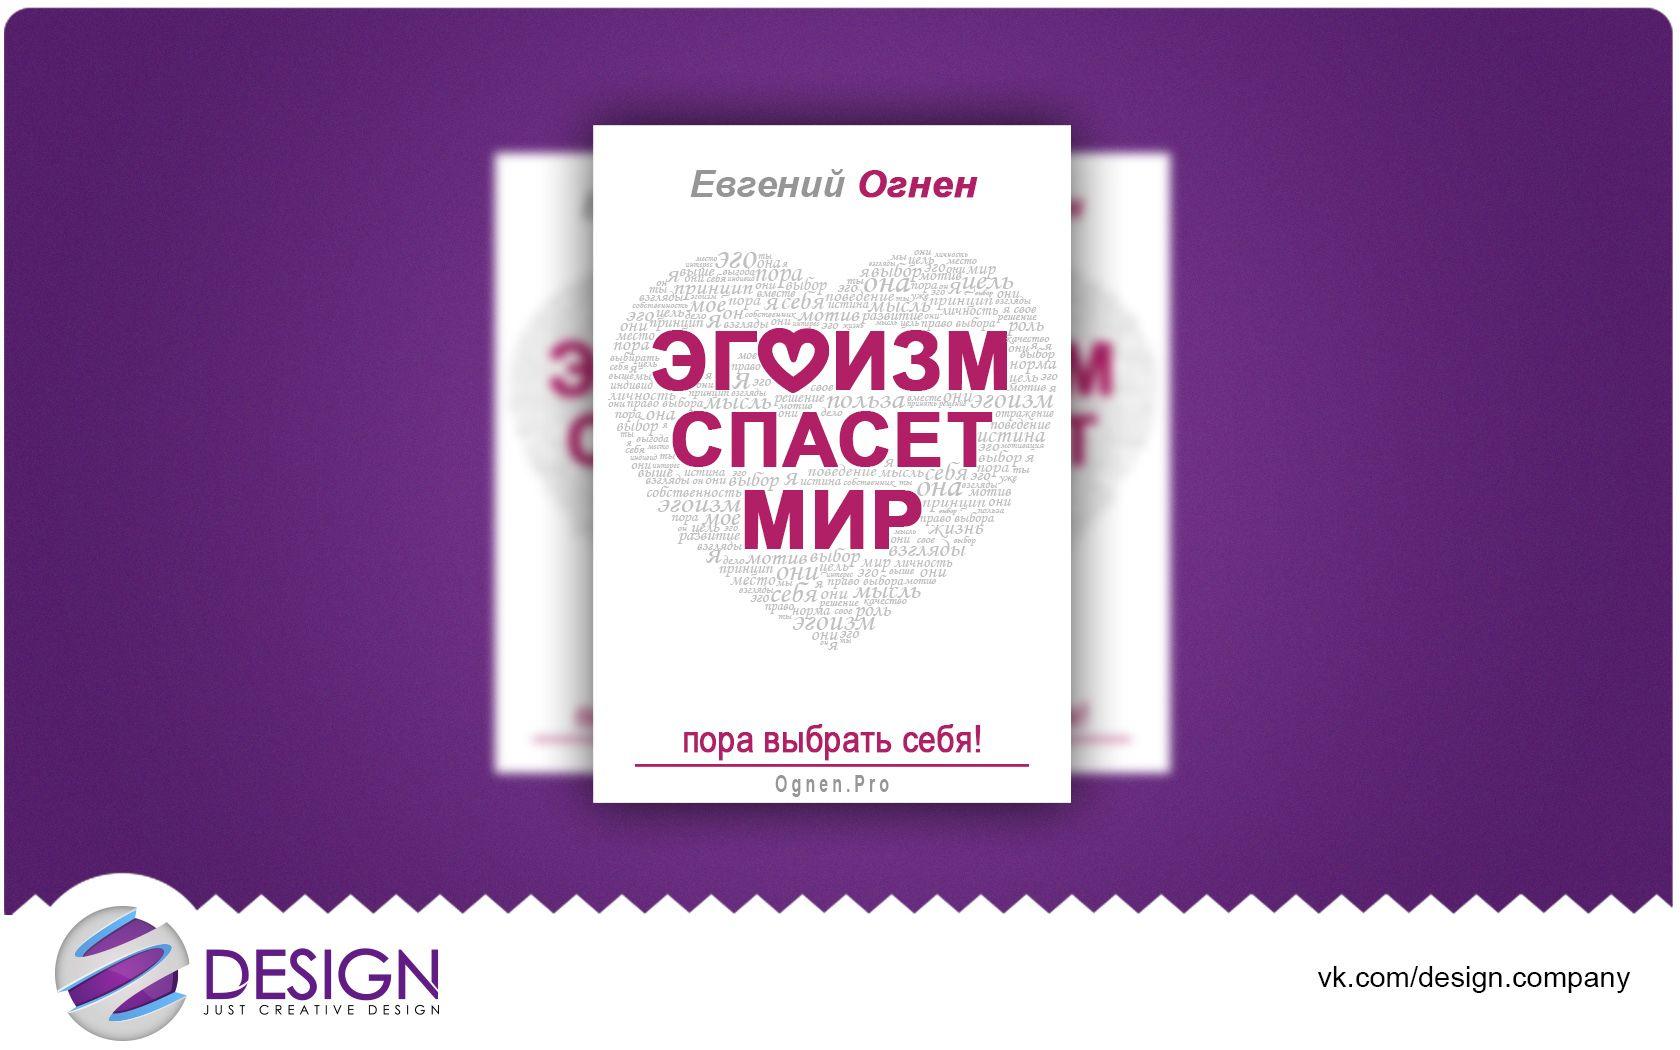 Обложка на книгу - Эгоизм спасет мир! - дизайнер Nicole-Designer